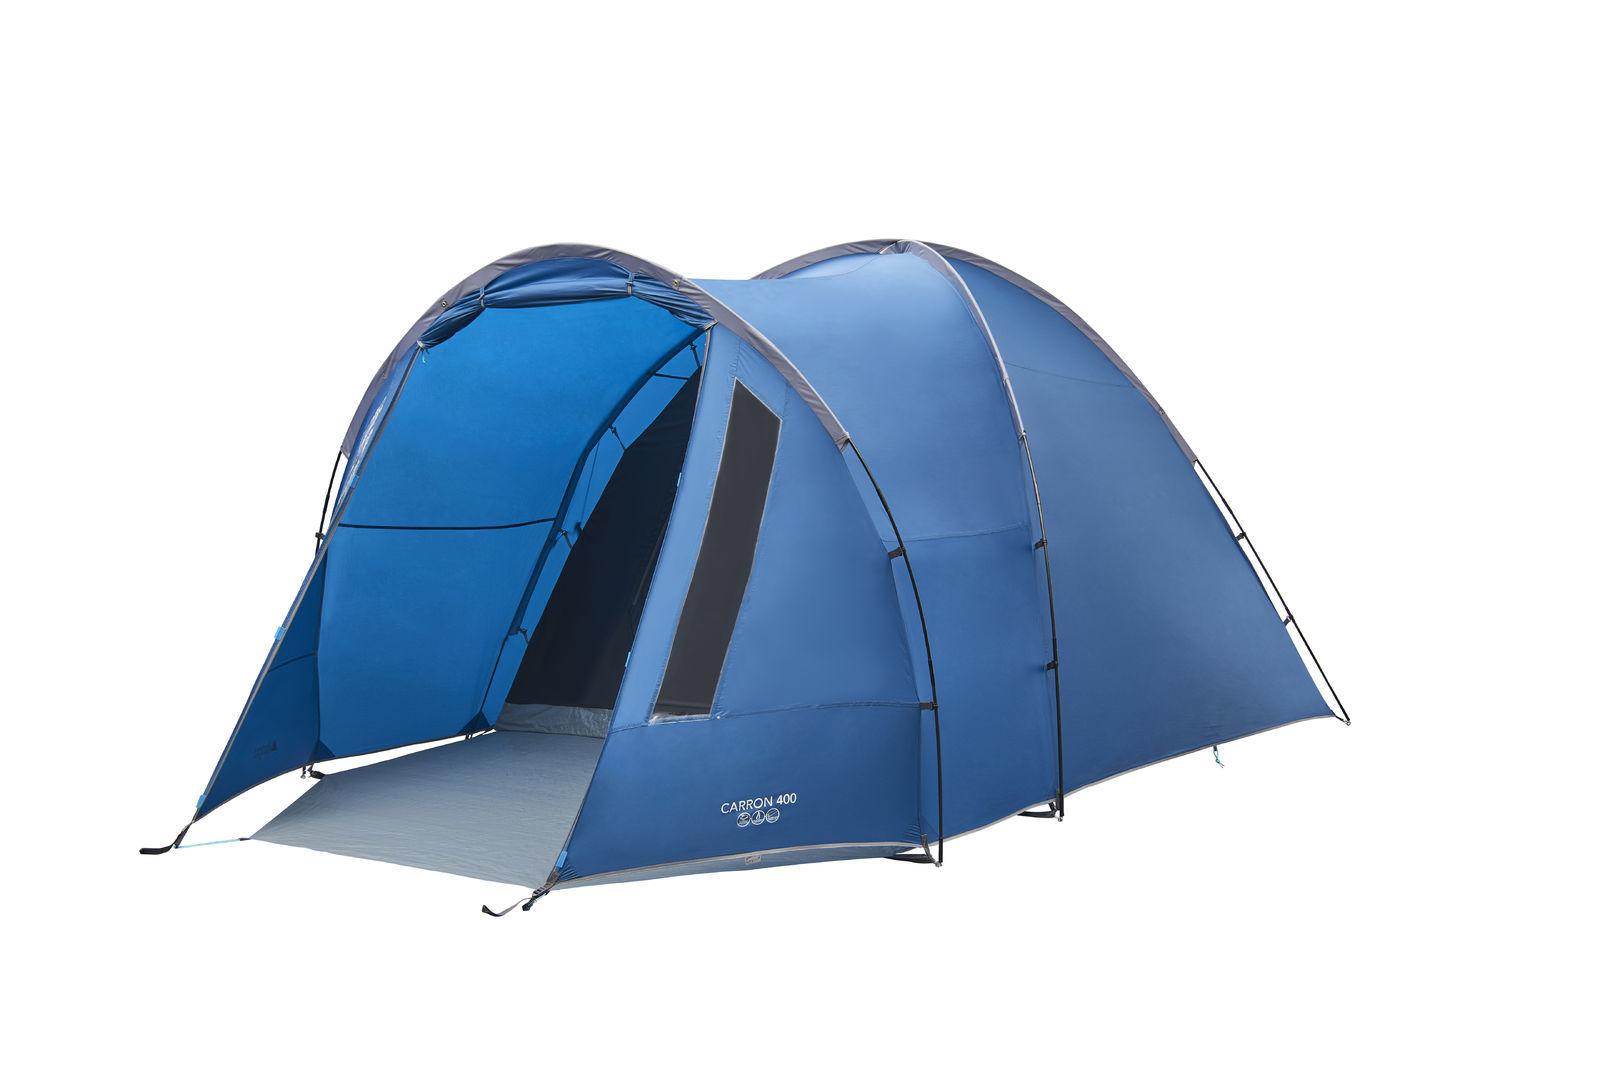 Vango Carron 400 2021 Norwich Camping 4